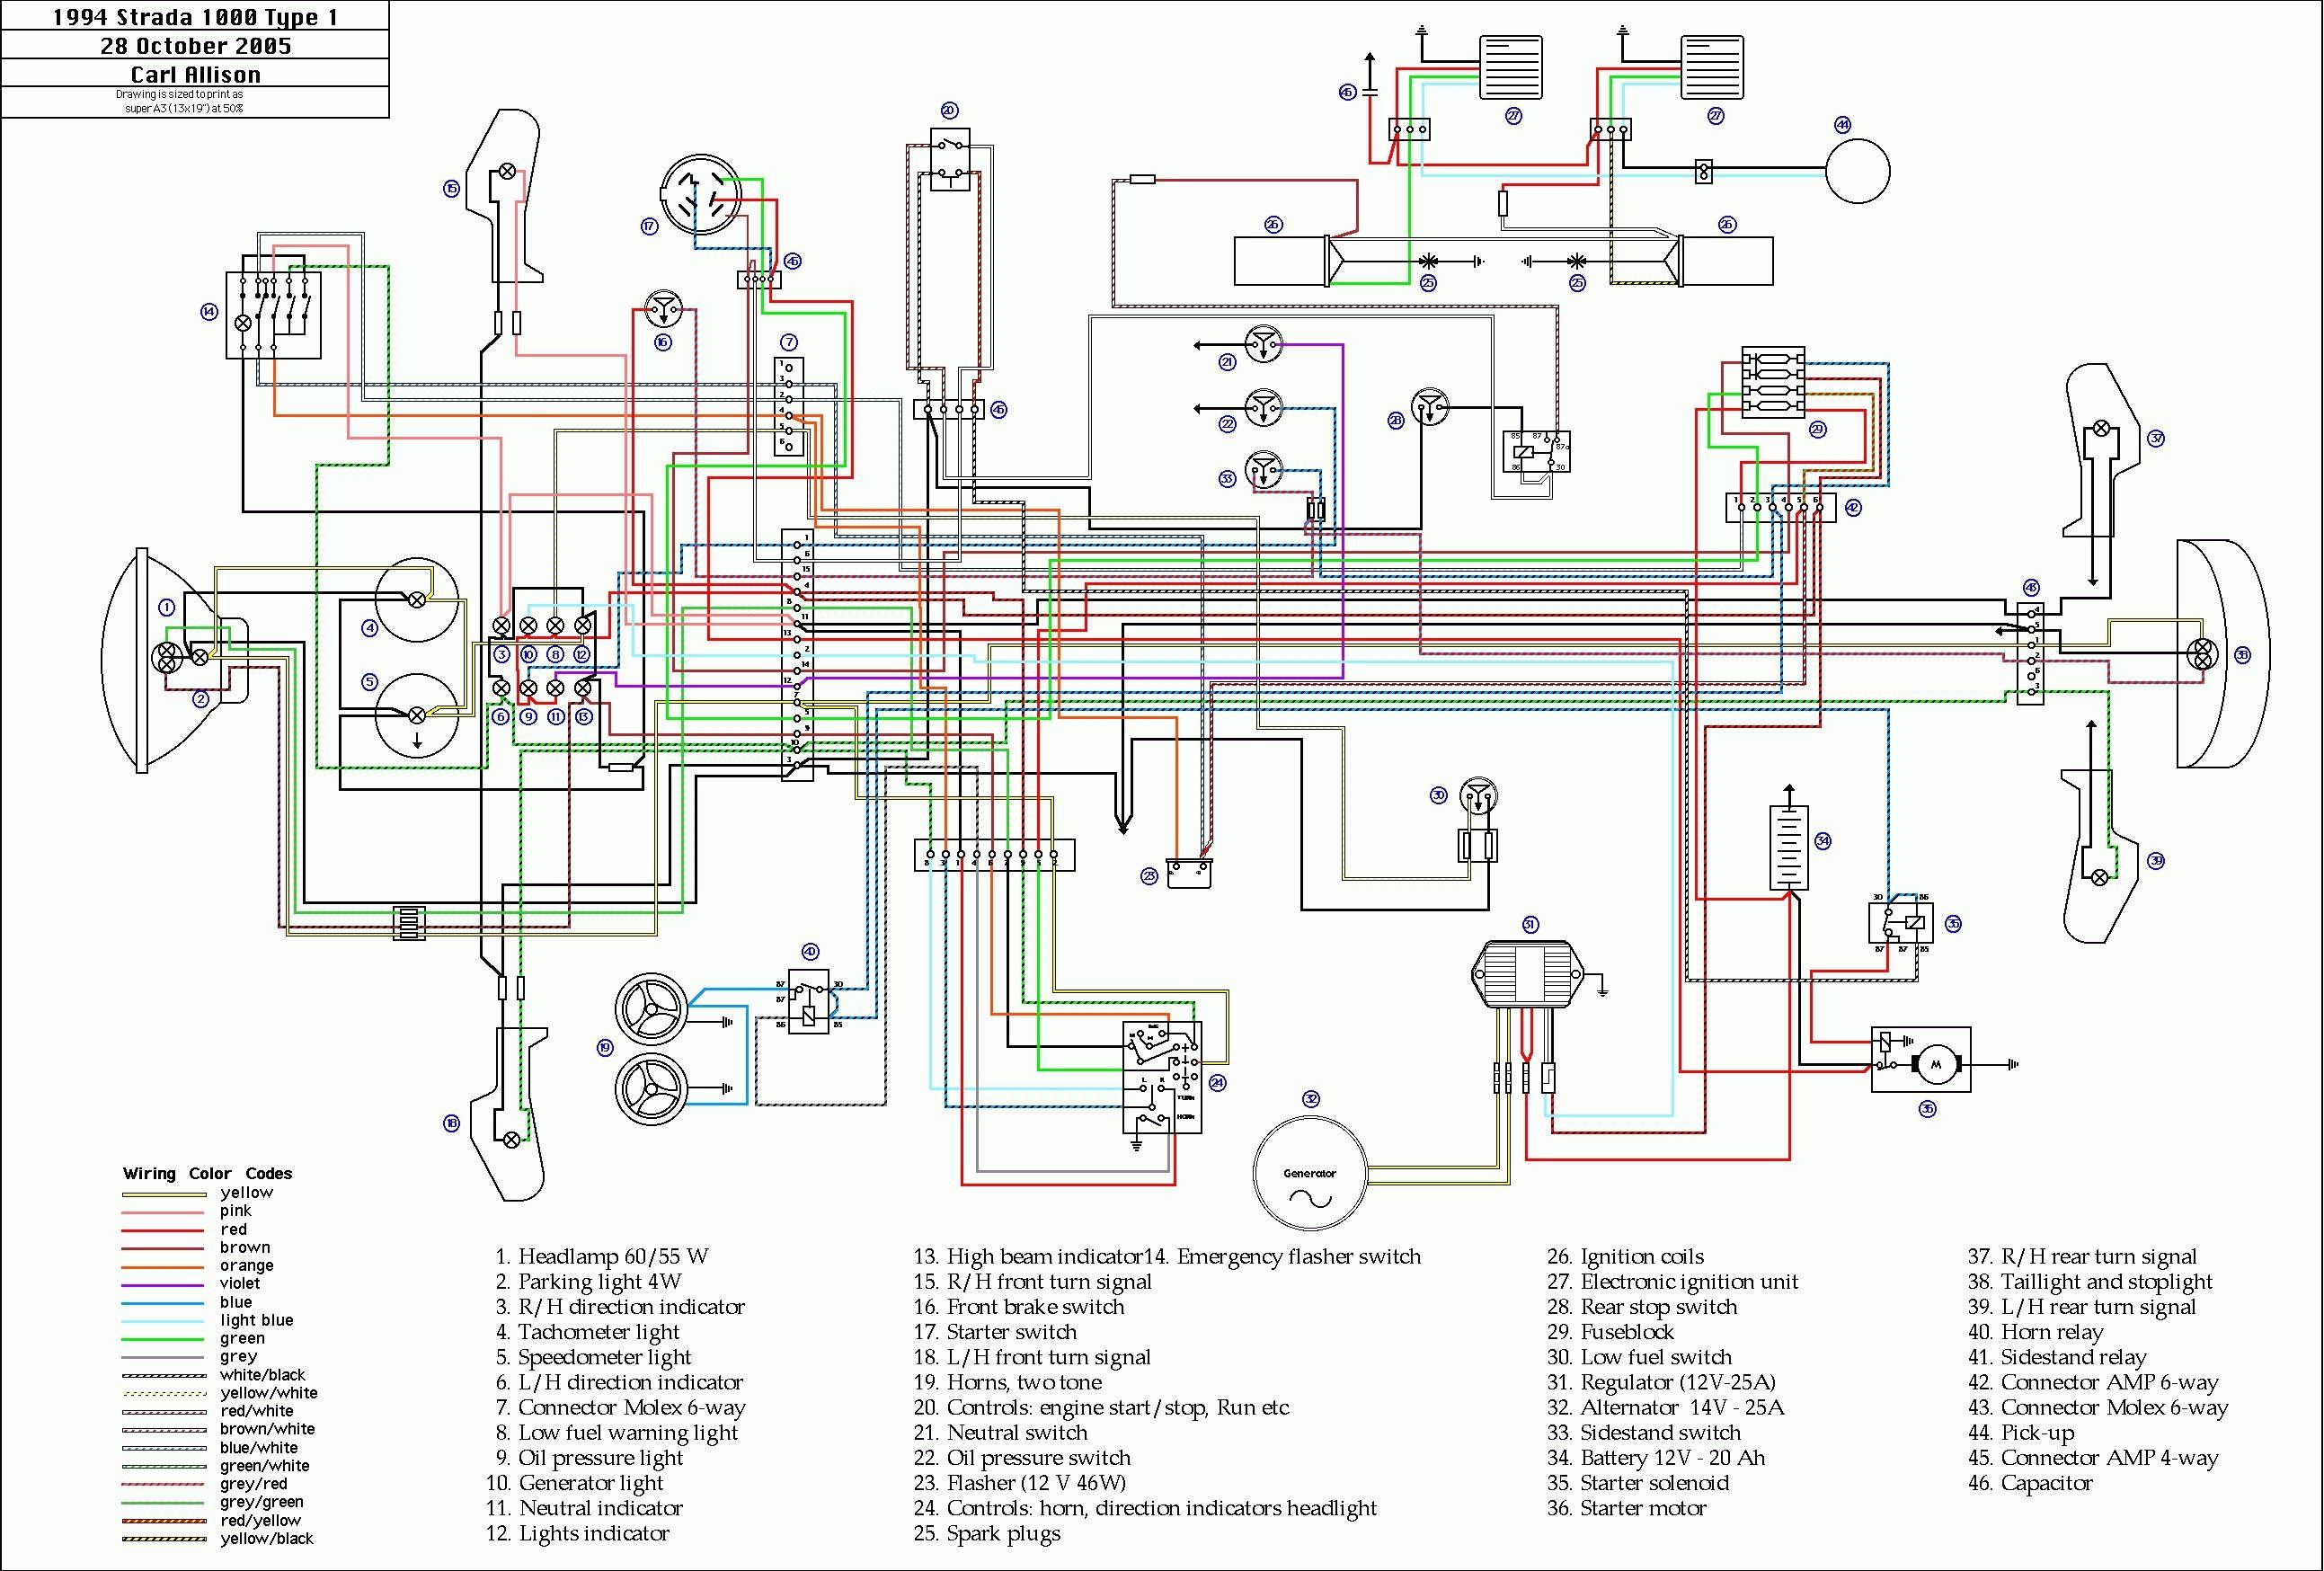 Wiring Diagram for Turn Signal Flasher Turn Signal Wiring Diagrams Wiring Diagrams Konsult Of Wiring Diagram for Turn Signal Flasher